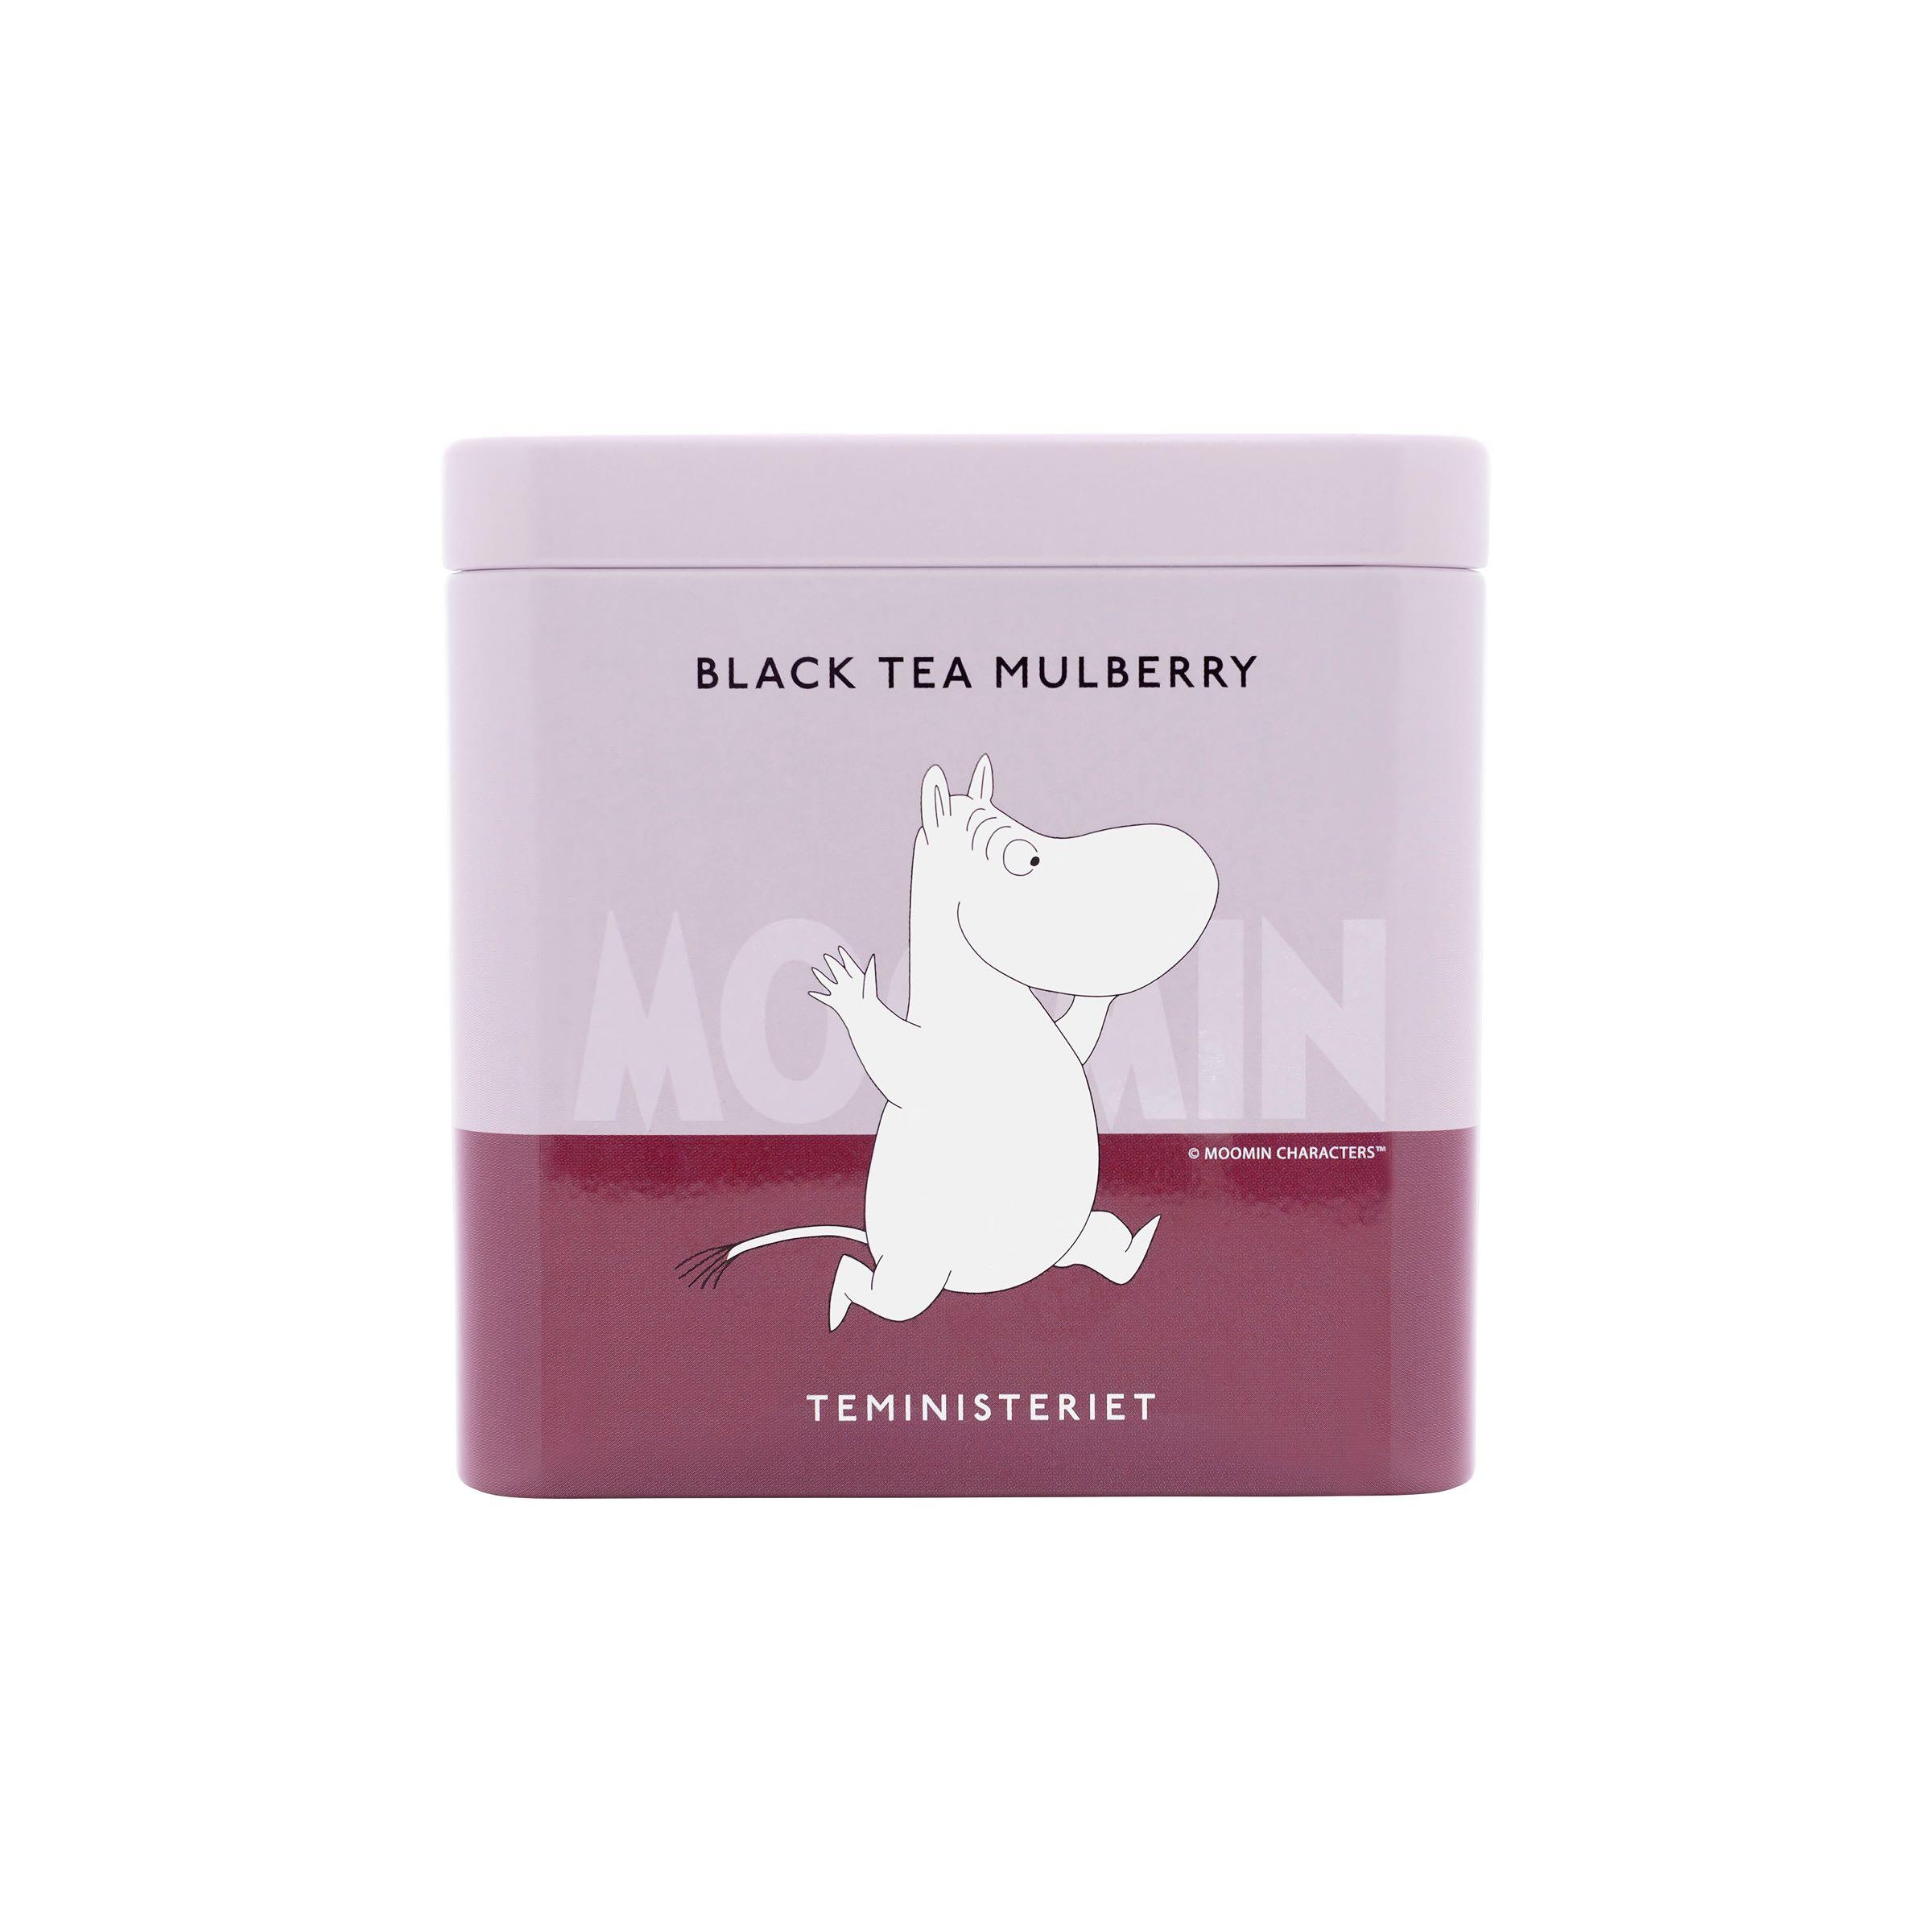 Teministeriet Moomin Te - Black Tea Mulberry